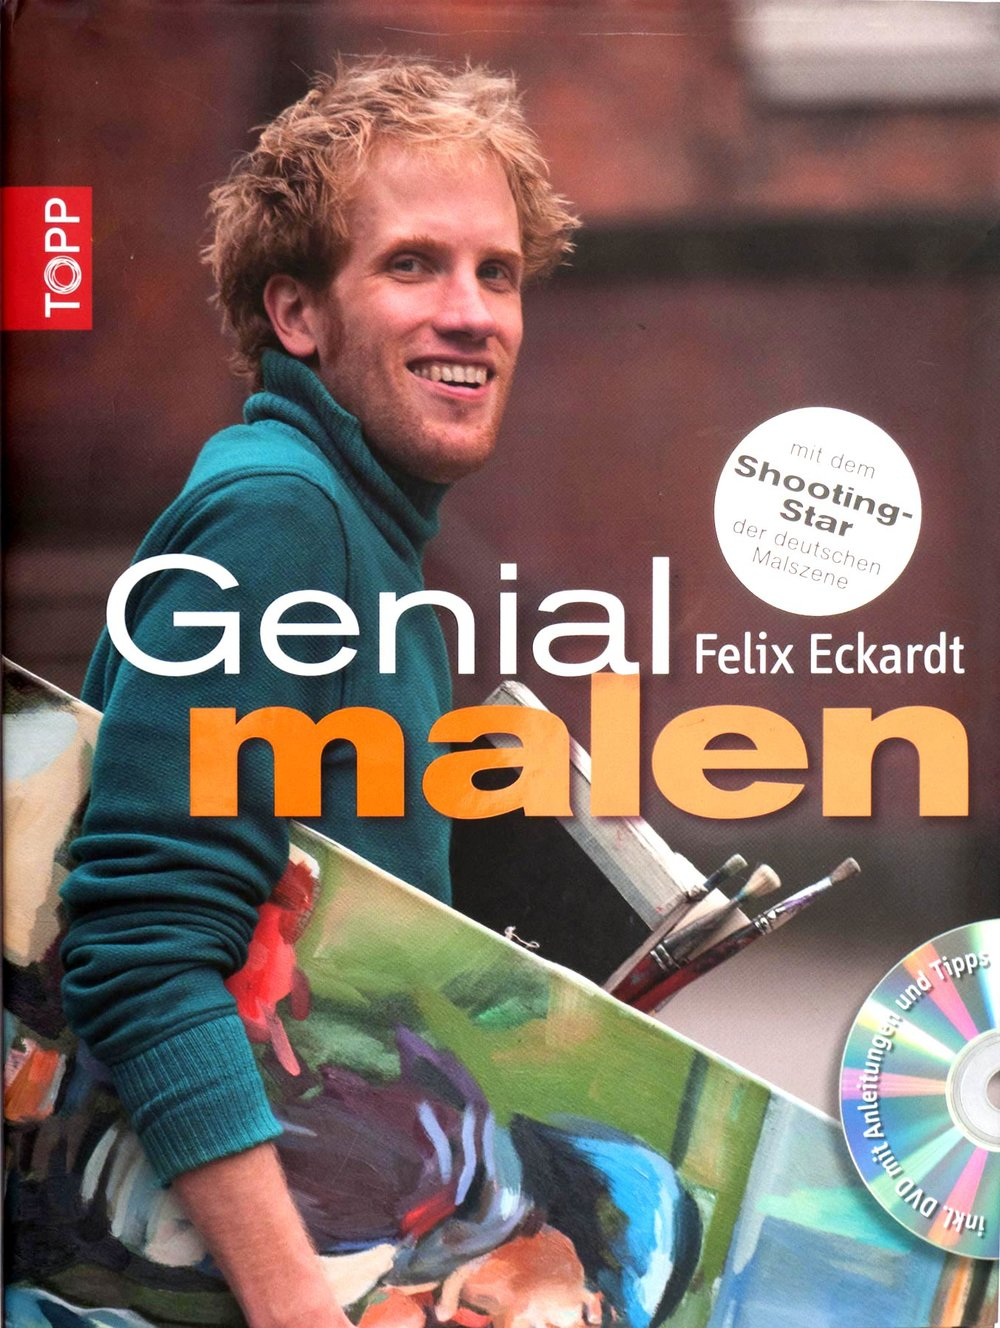 Felix-Eckardt_Genial-Malen.jpg